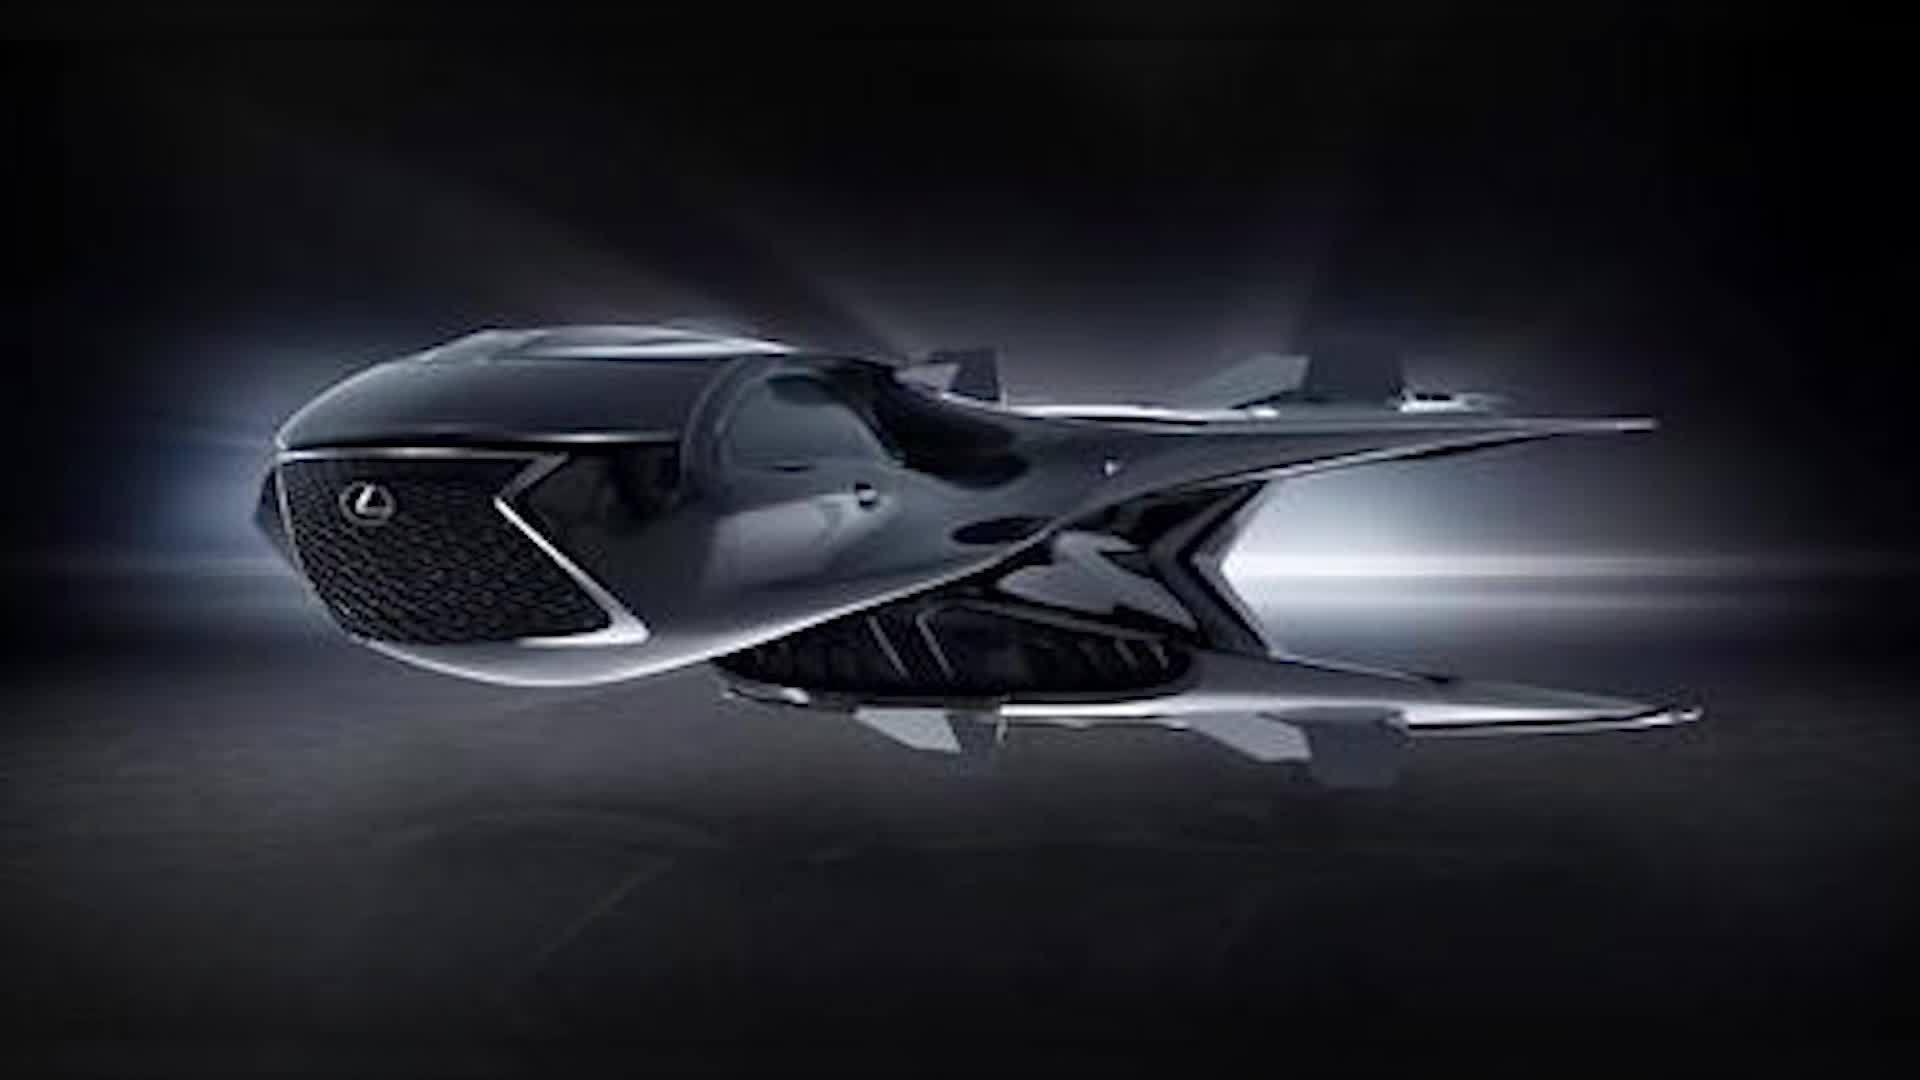 Lexus goes intergalactic space craft concept jet